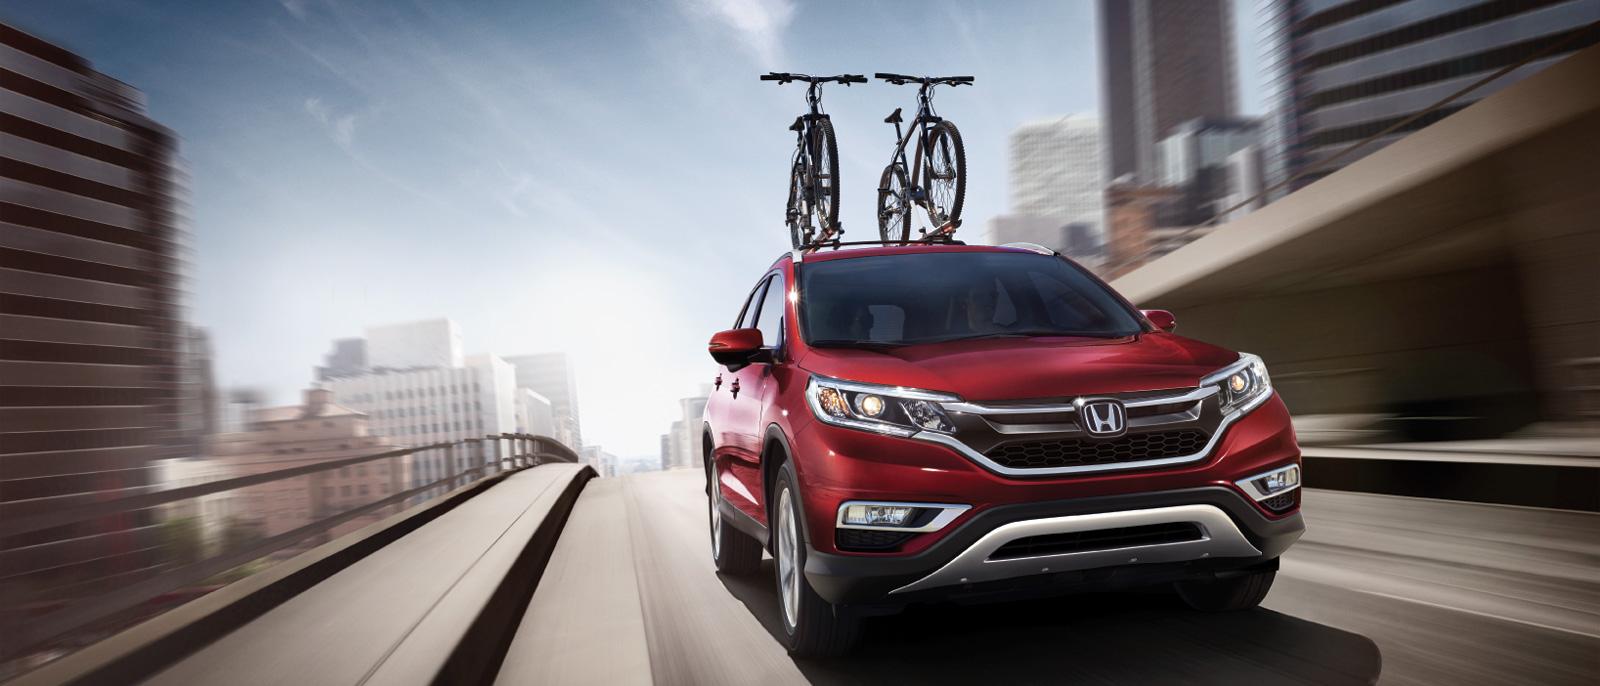 2015 Honda CR-V with optional bike rack